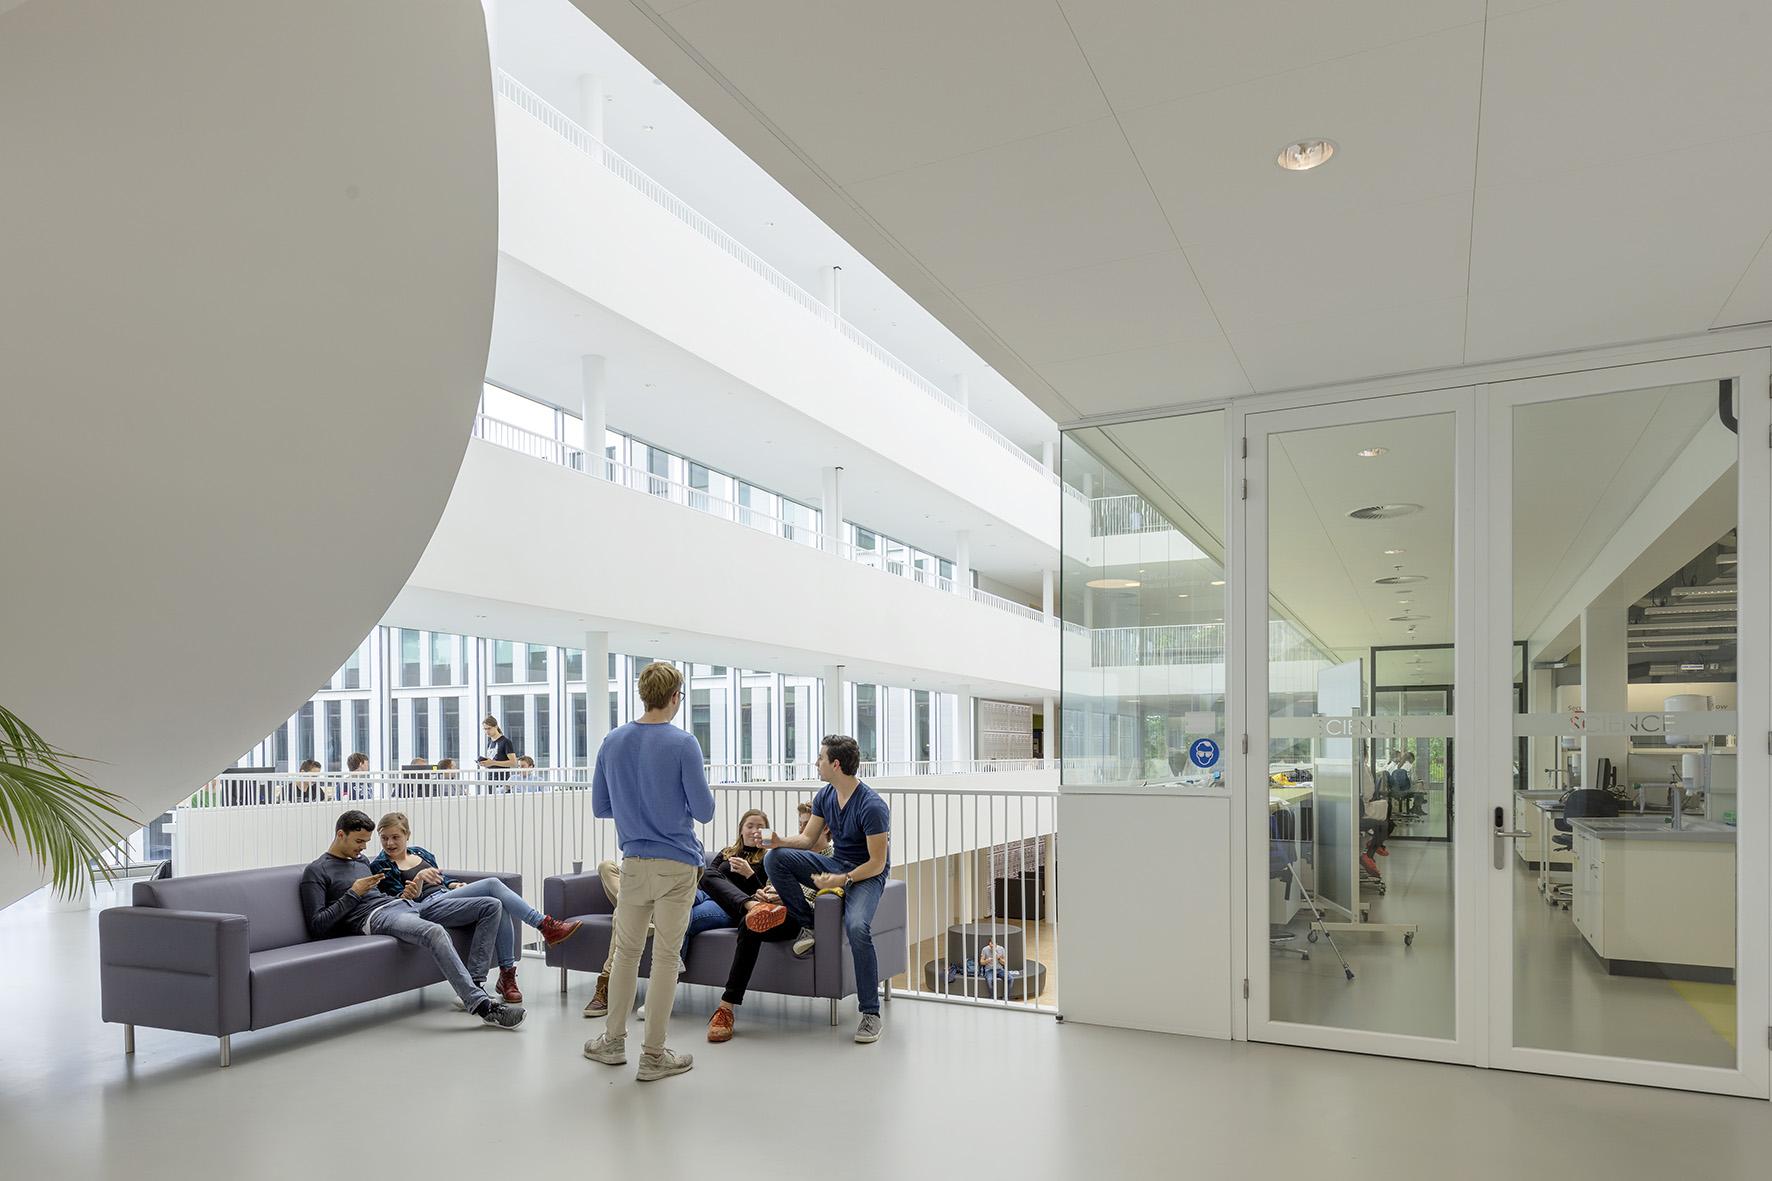 JHK Architecten + Inbo